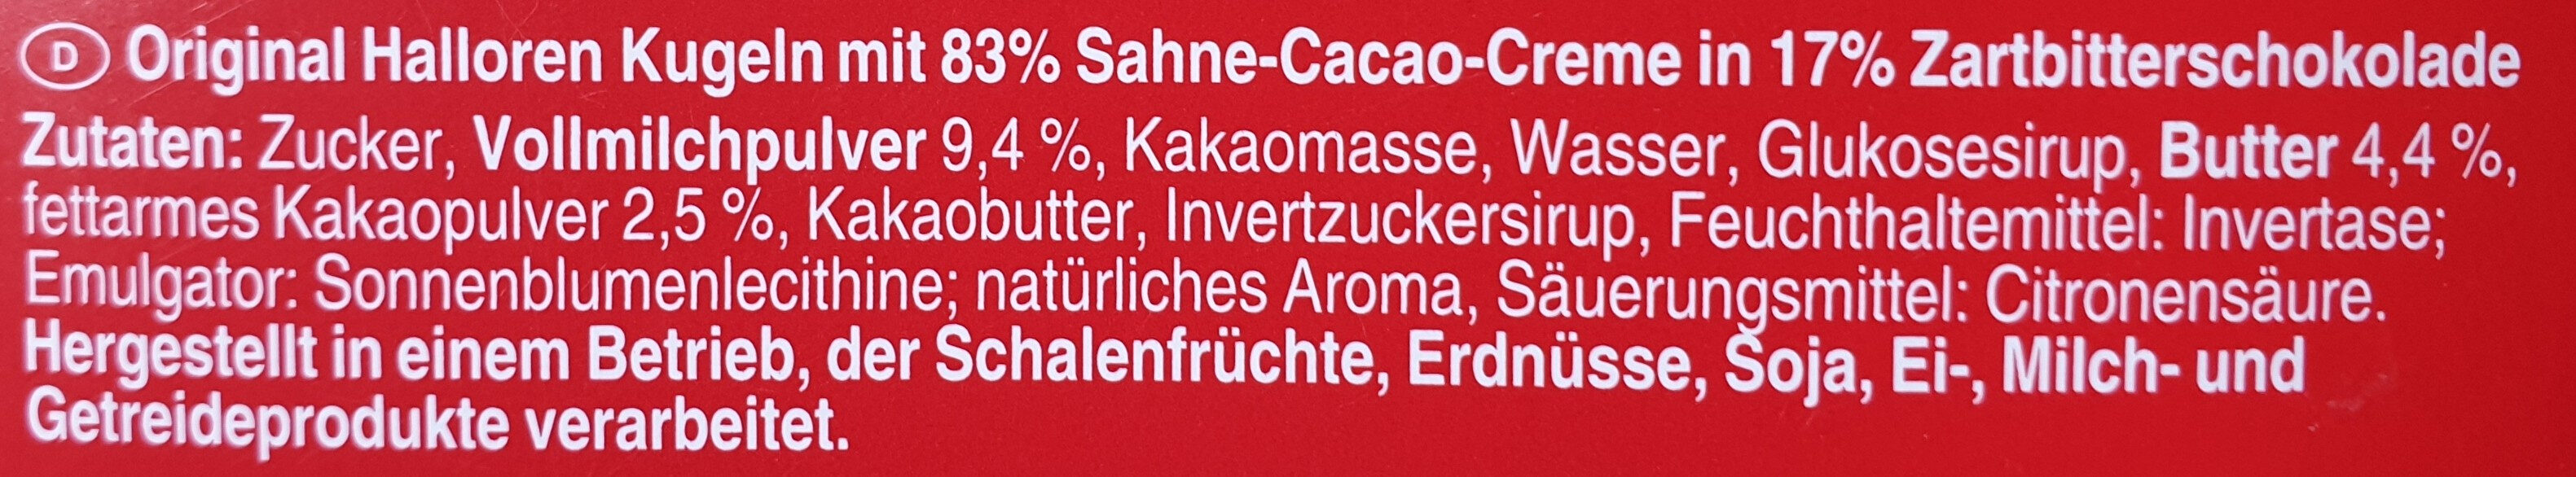 Original Halloren Kugeln Sahne-Cacao - Ingrédients